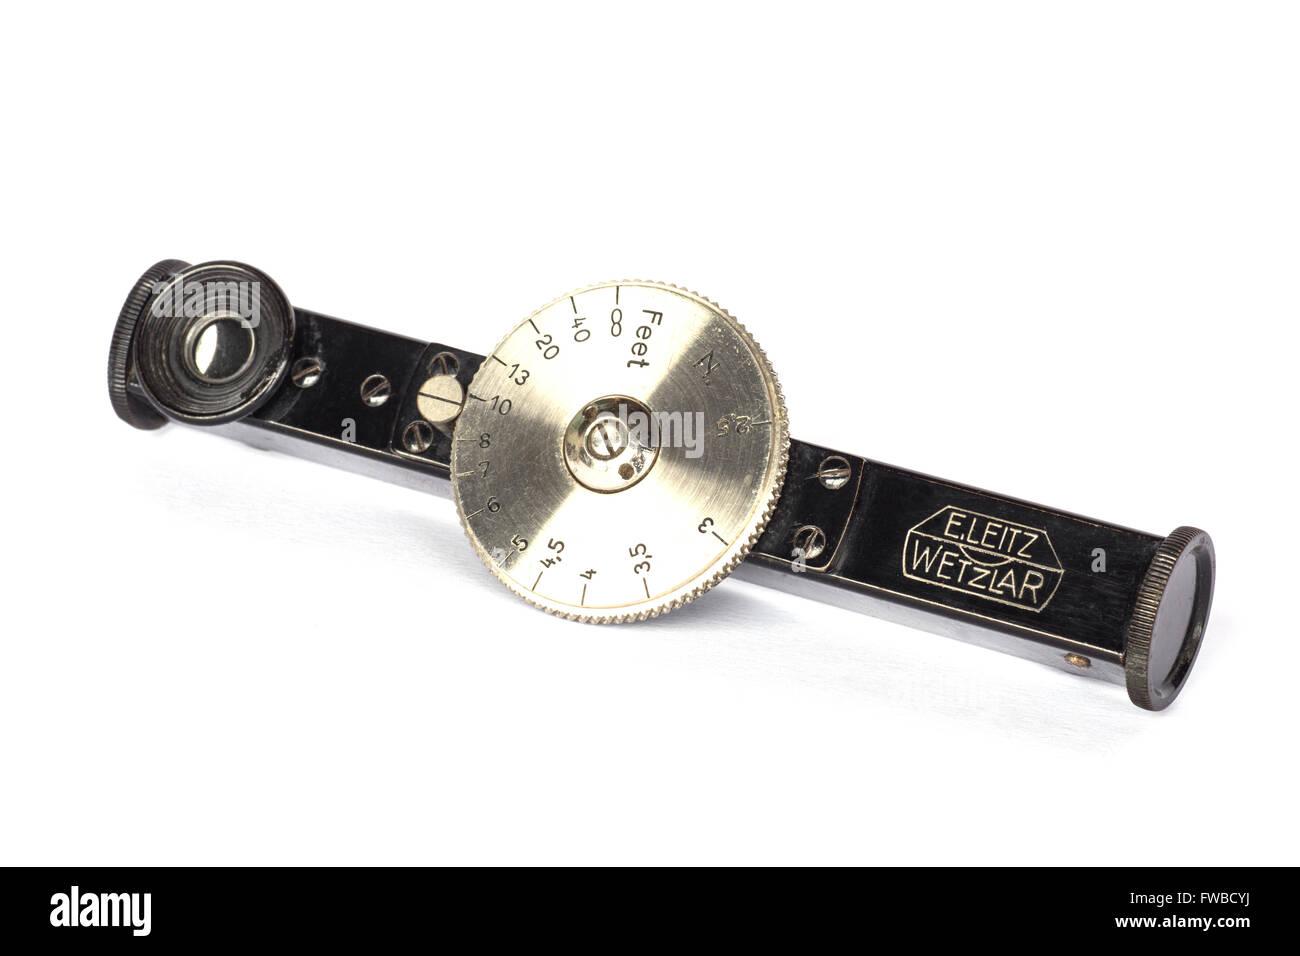 Leica Entfernungsmesser Fokos : 1930er jahre leica kamera entfernungsmesser stockfoto bild